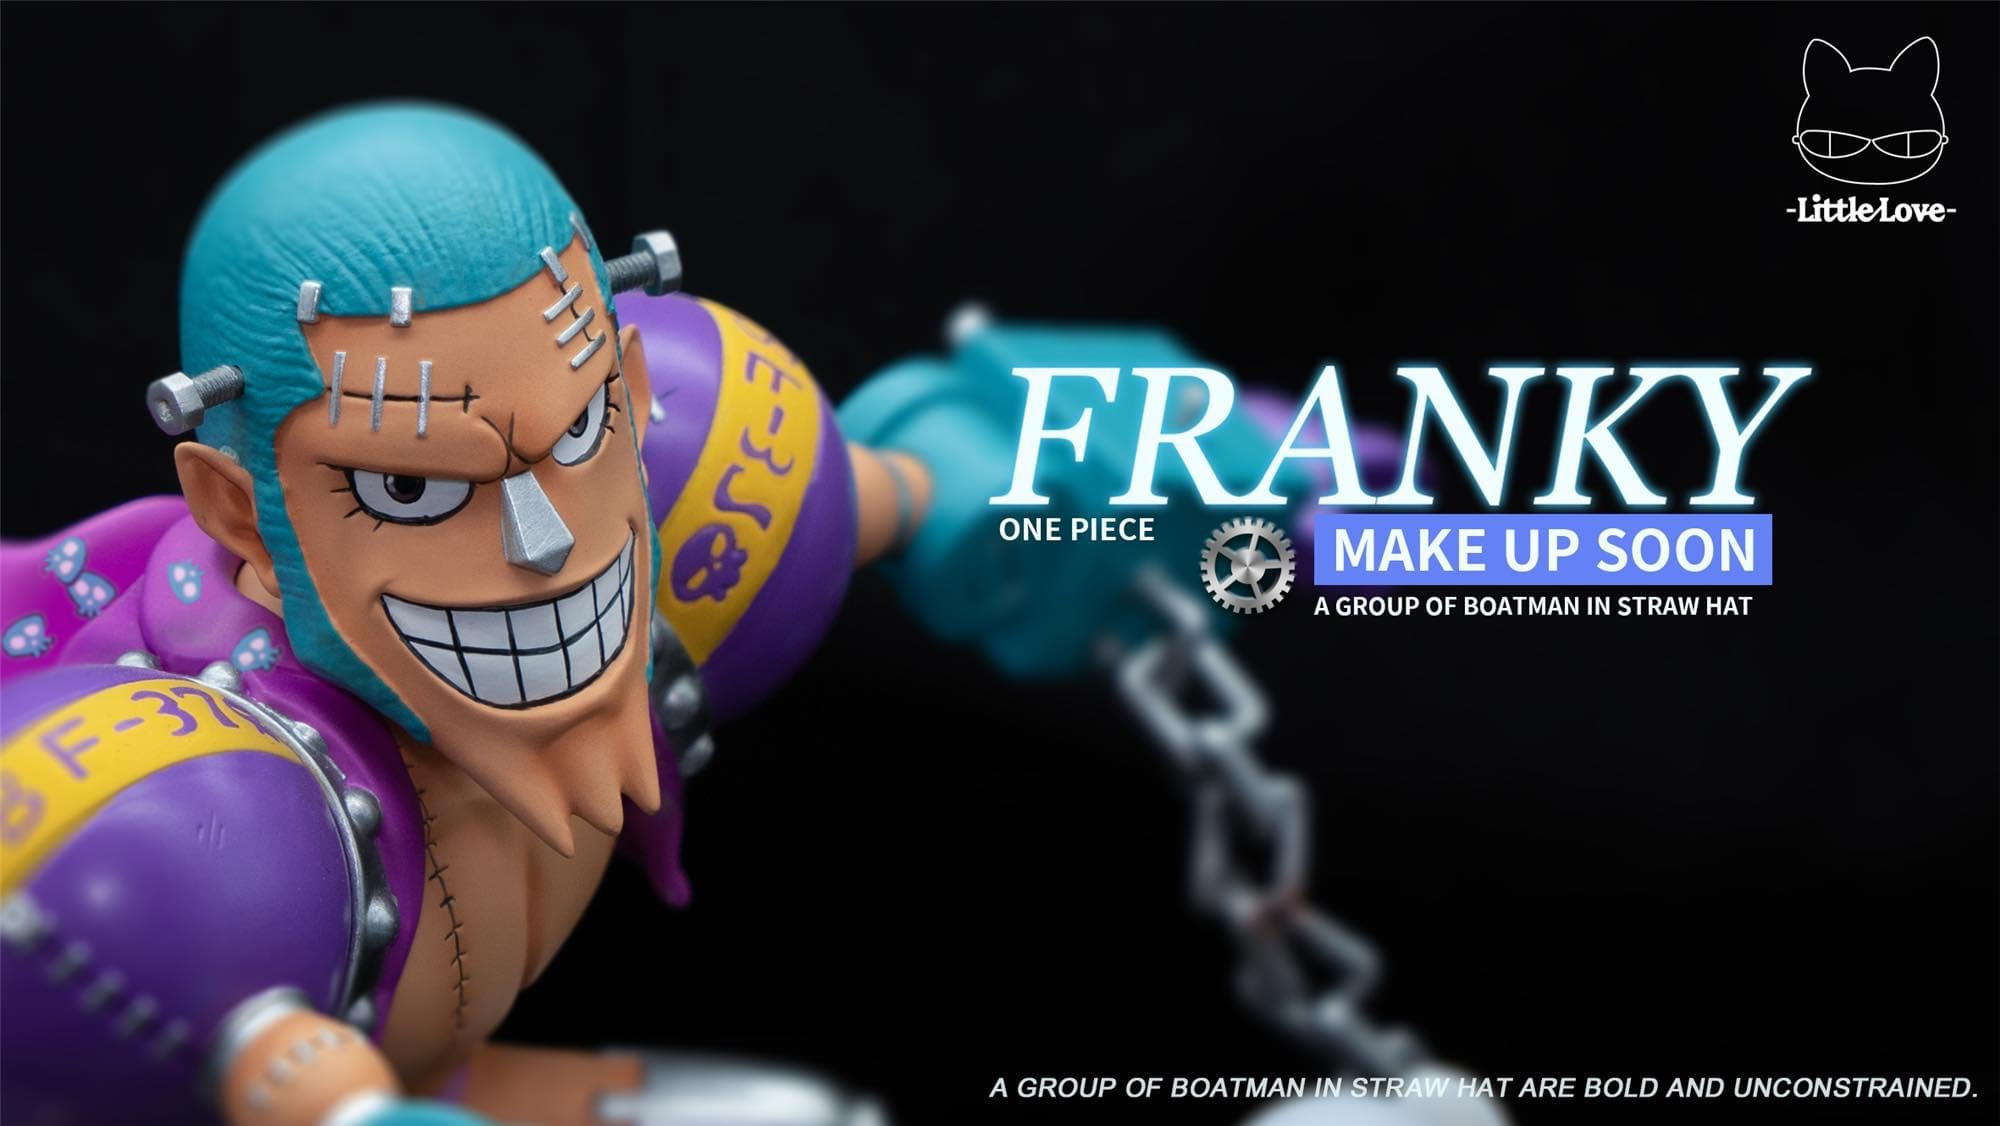 Franky แฟรงกี้ แฟรงเกนสไตน์ Little Love (มัดจำ)